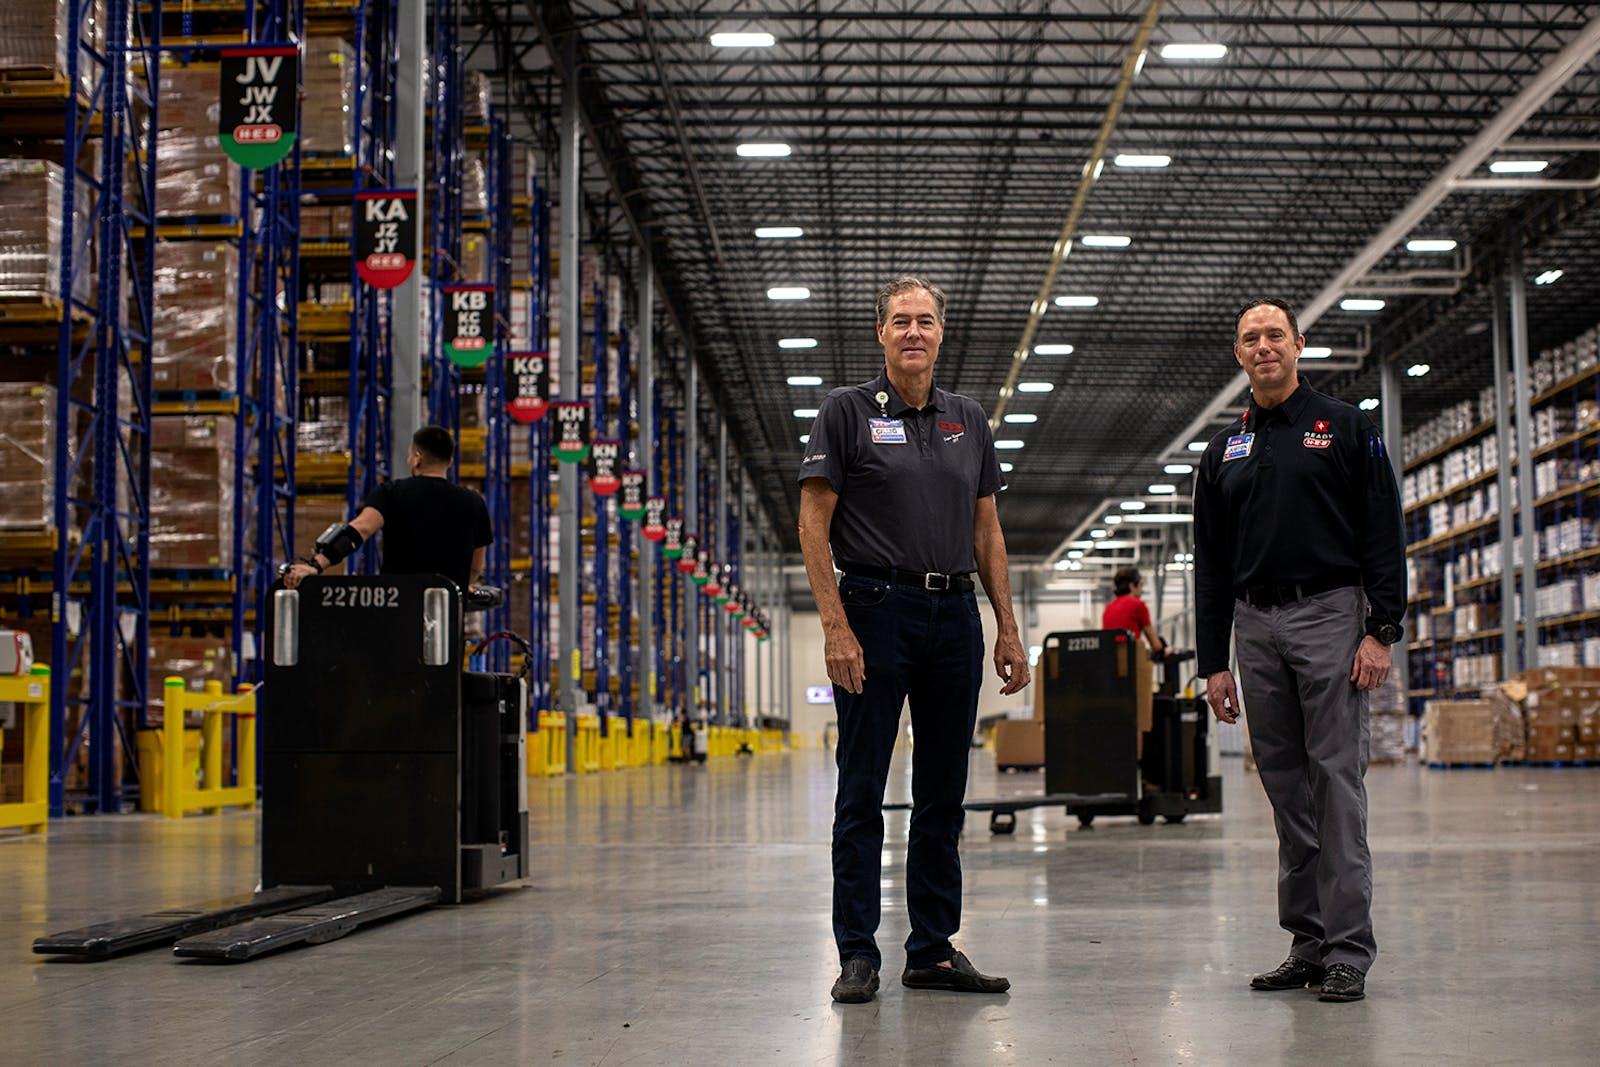 HEB Warehouse in San Antonio